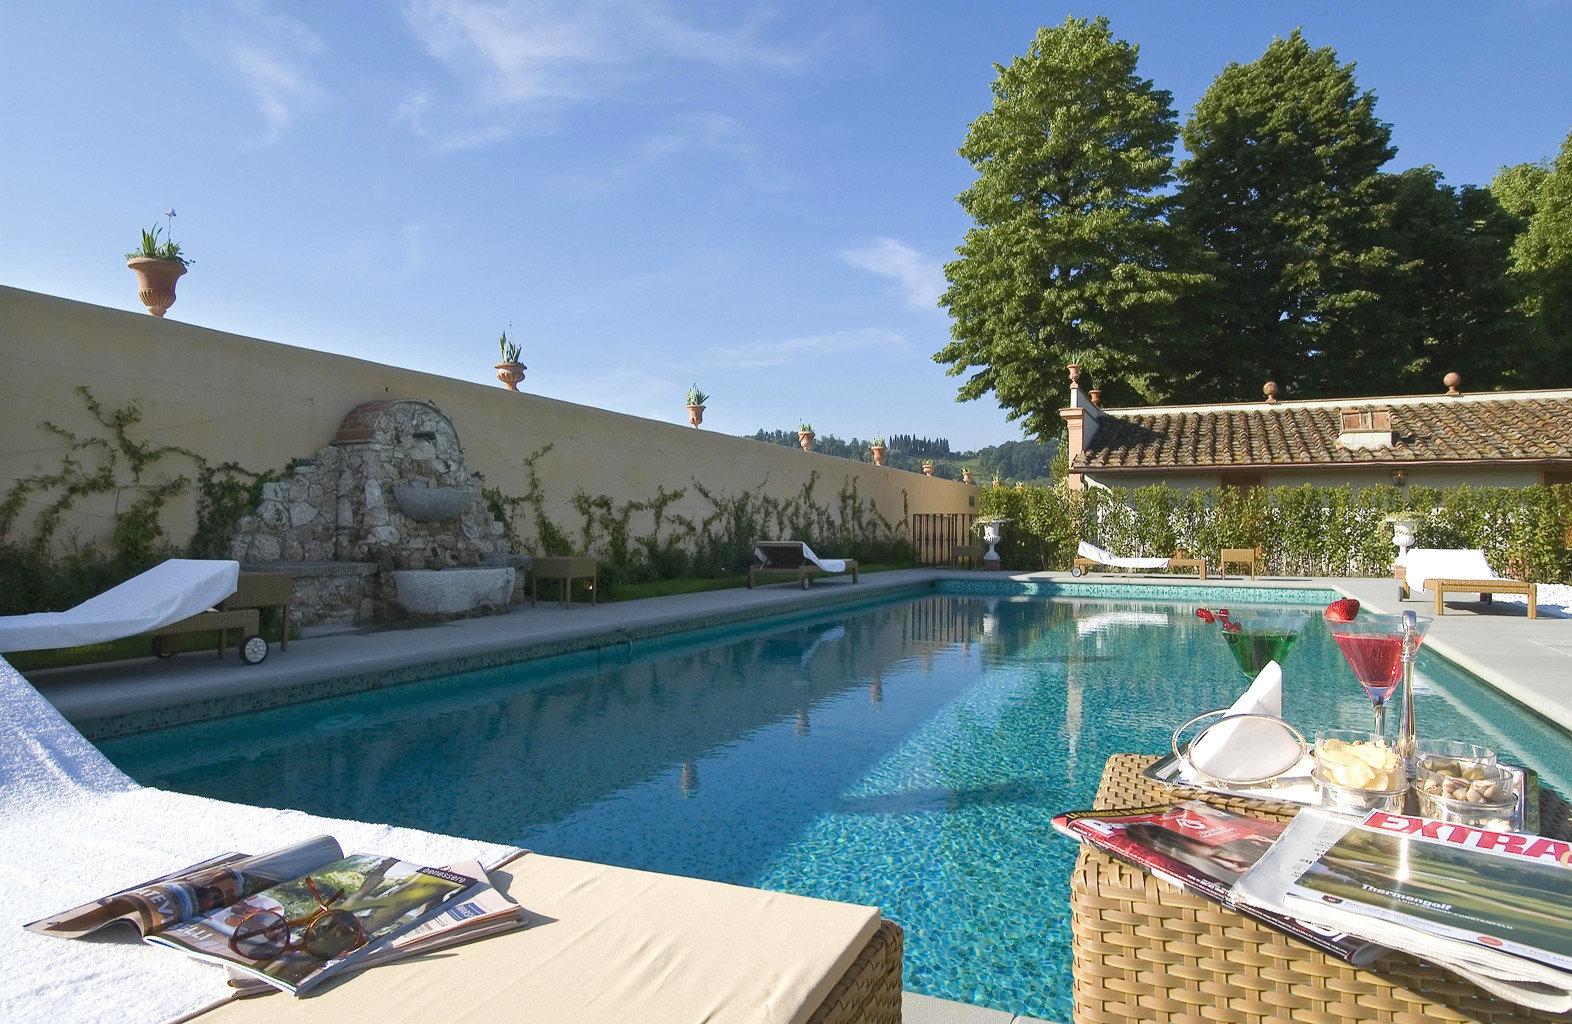 Country Drink Lounge Play Pool sky swimming pool leisure property Villa Resort backyard